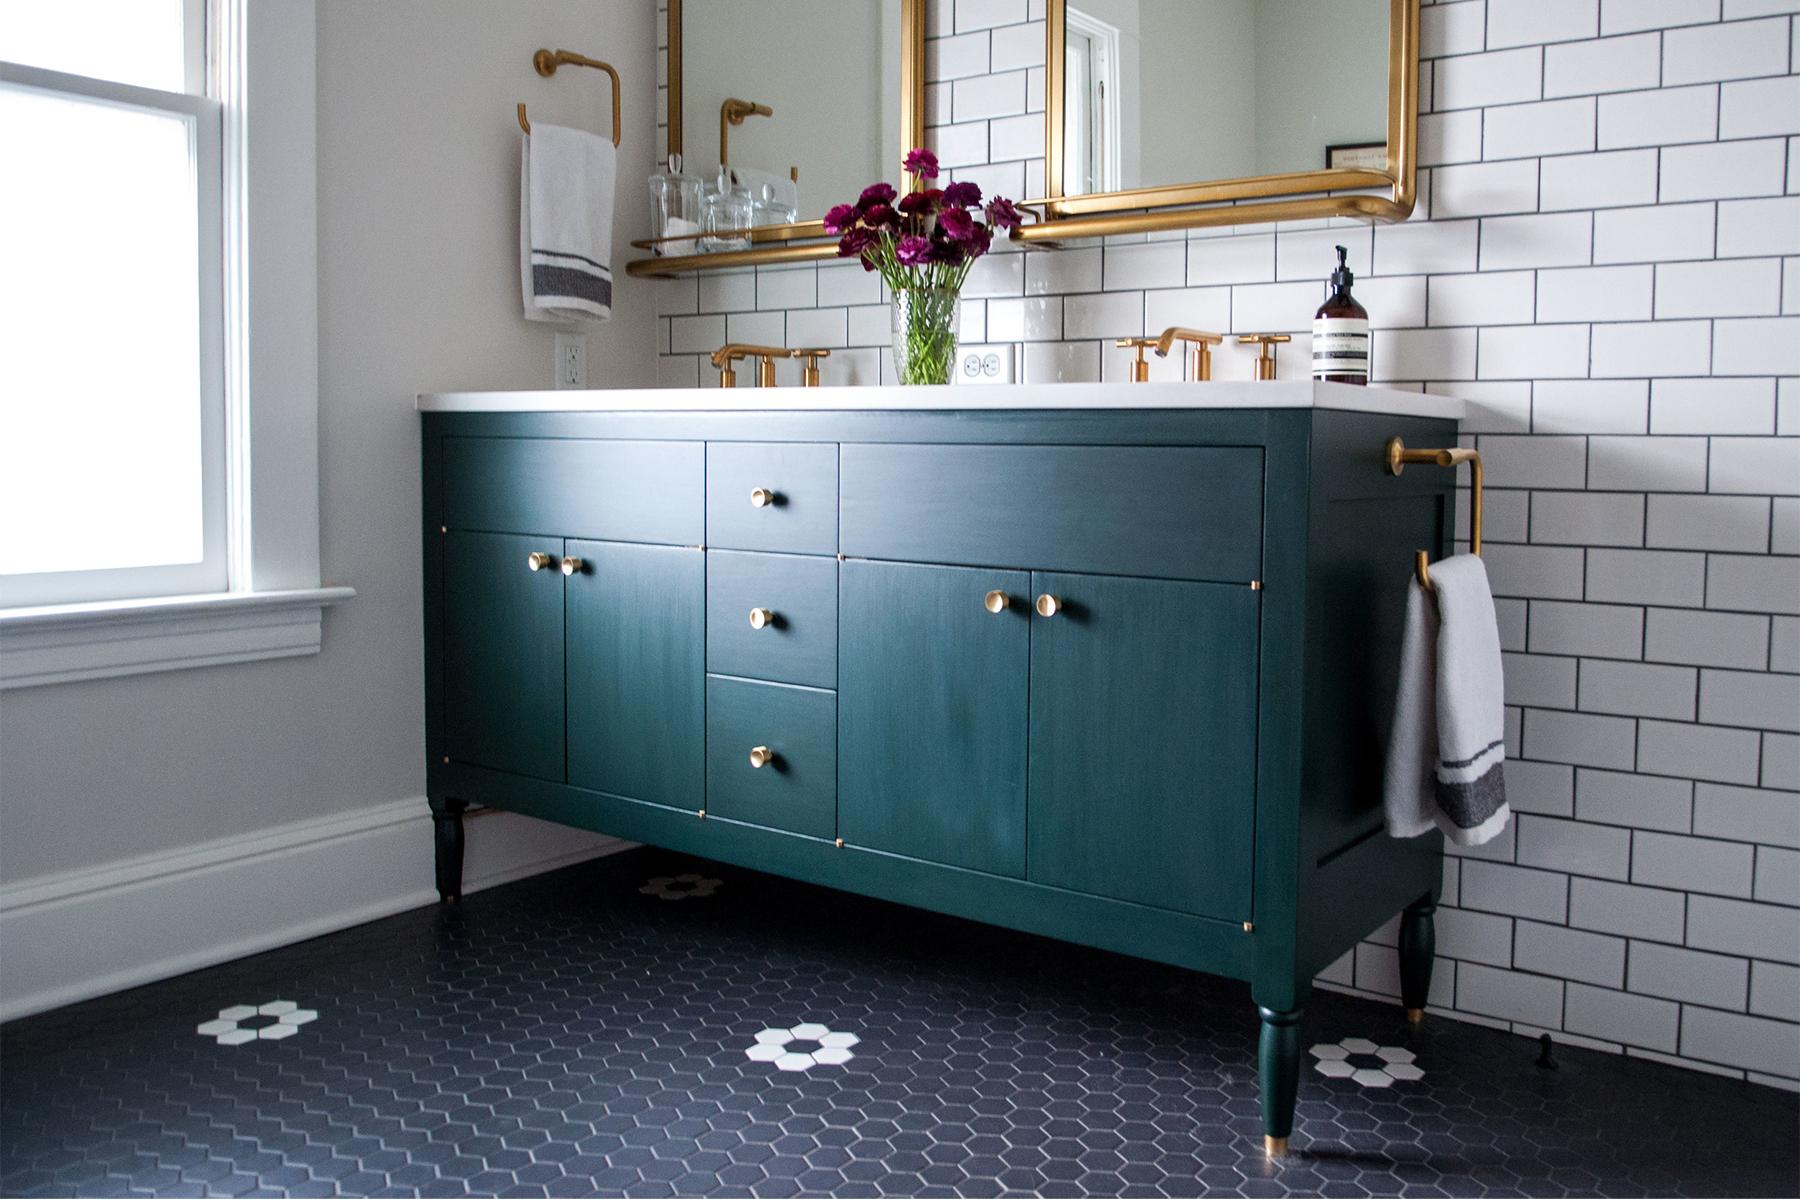 Master Bathroom with Brass Details & Green Vanity | Casework Interior Design | Portland, OR